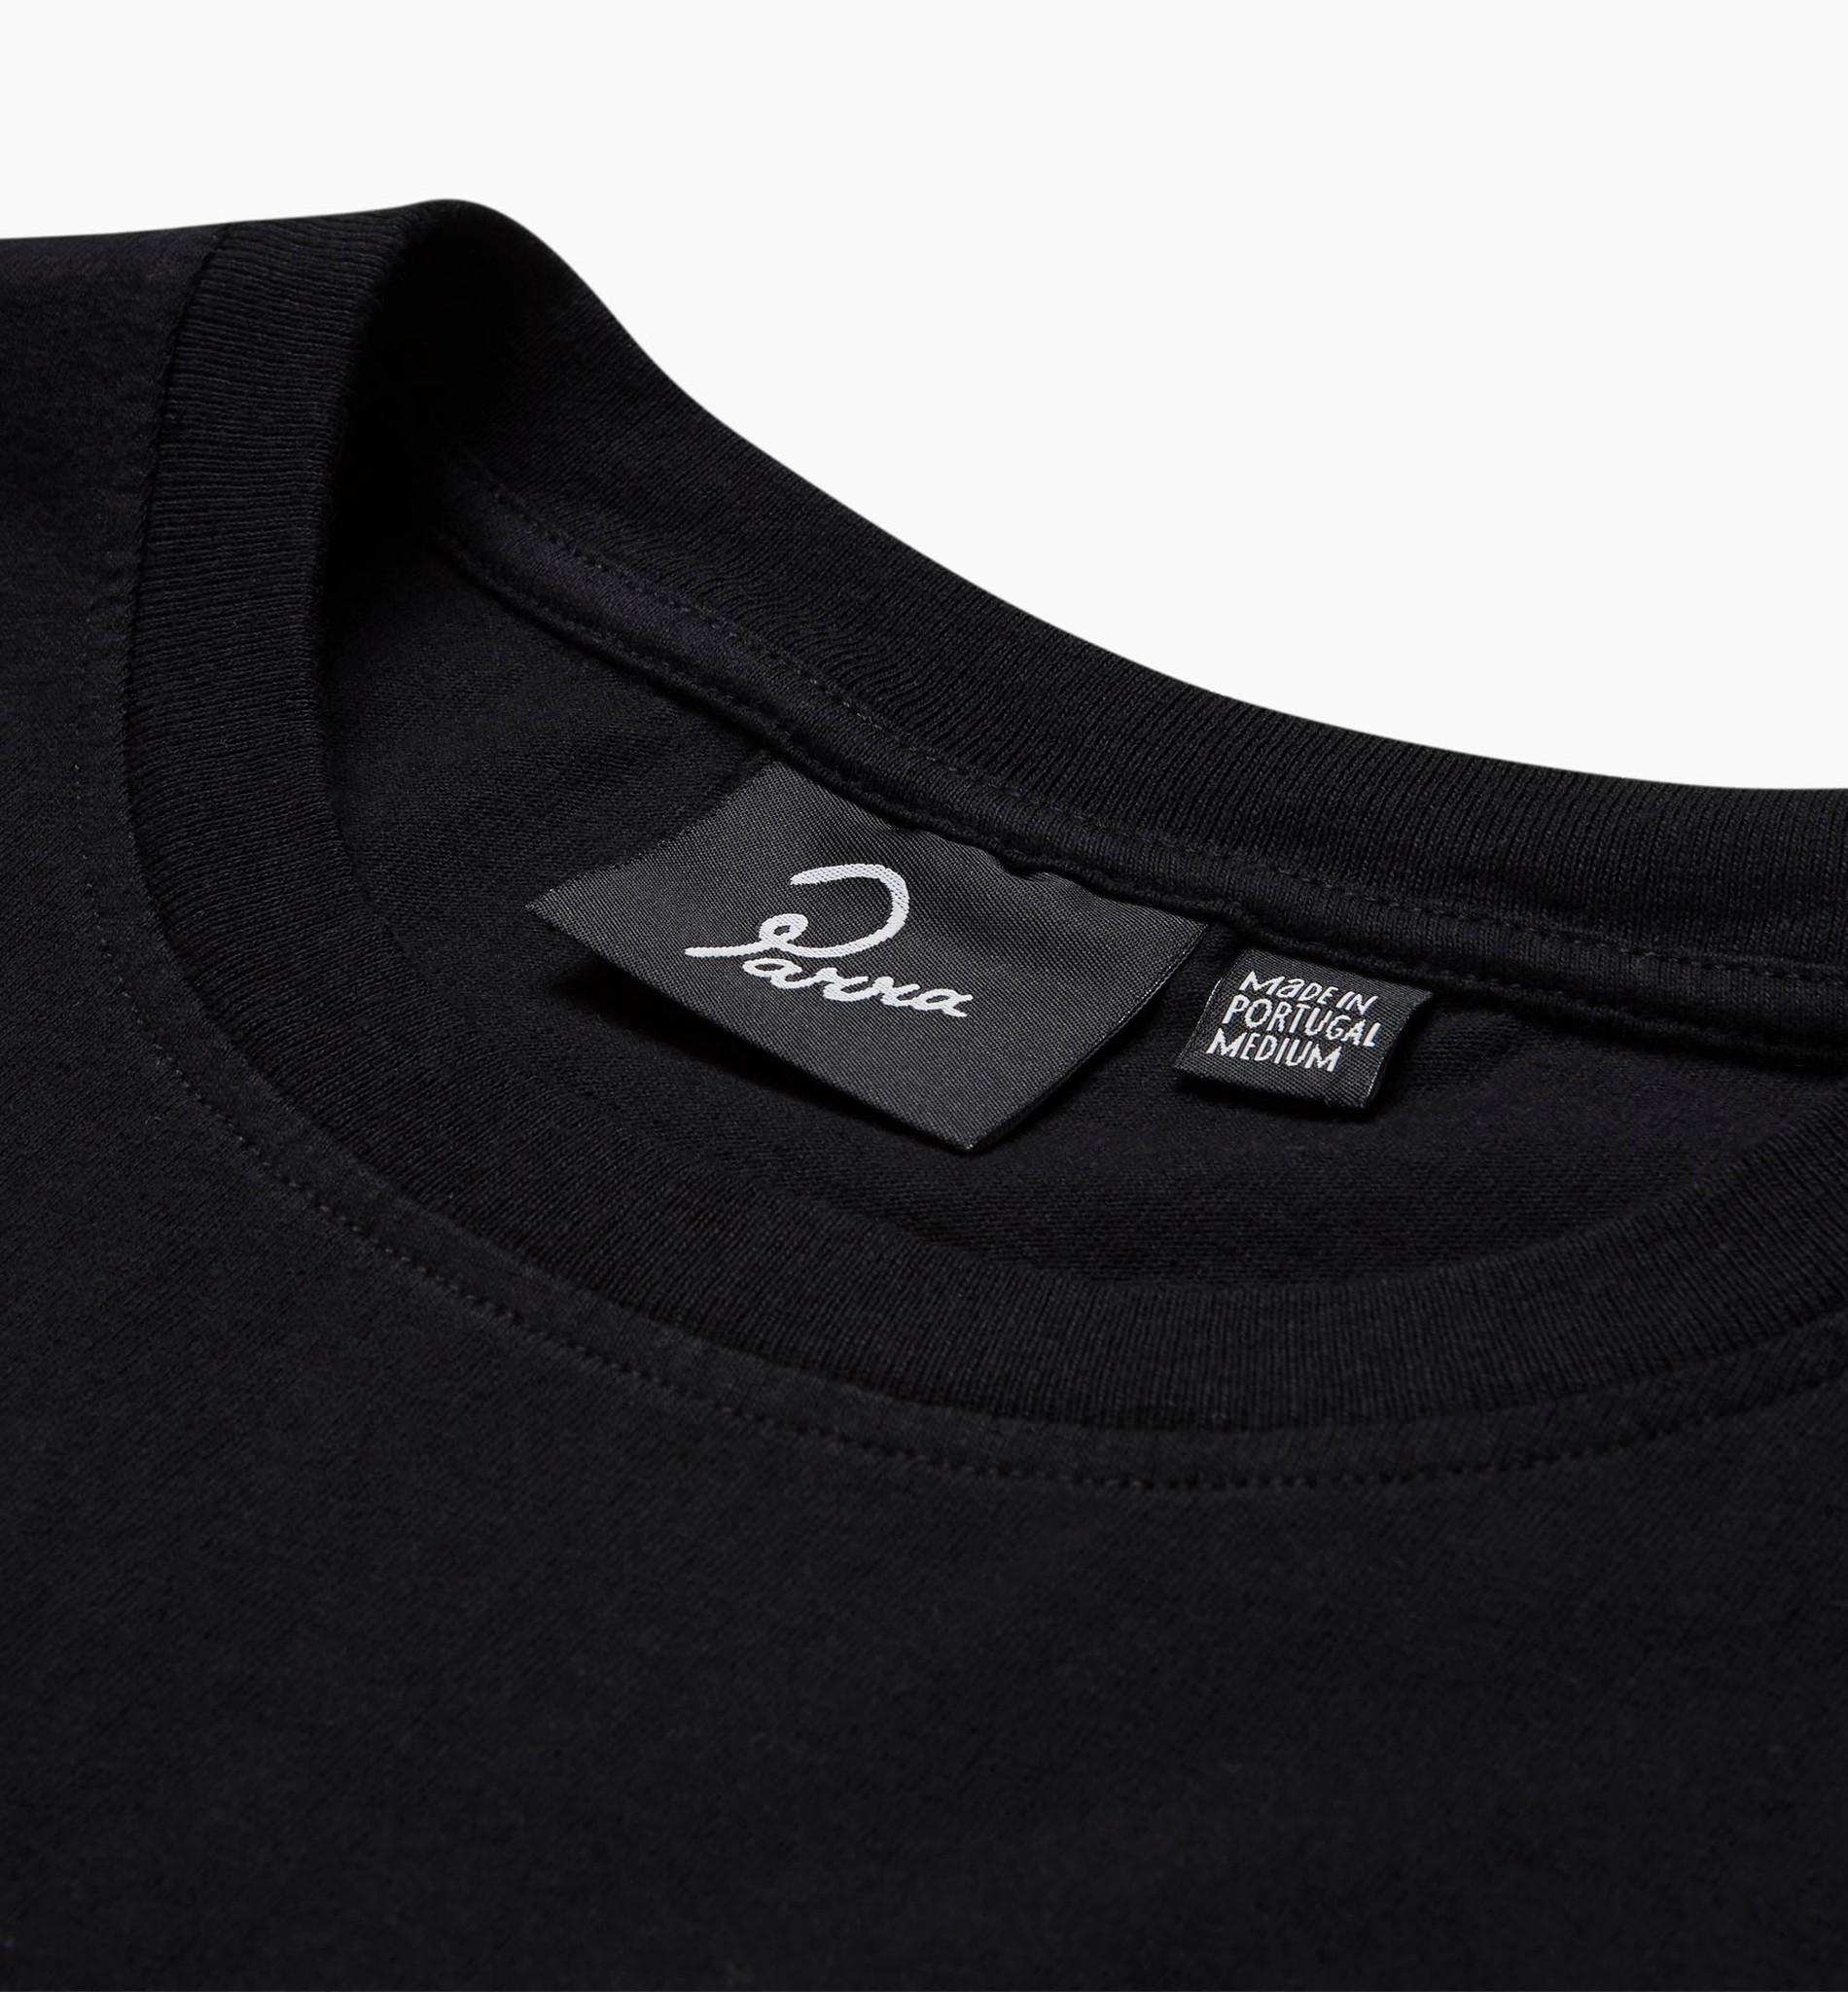 by Parra Open Eye T-Shirt Black